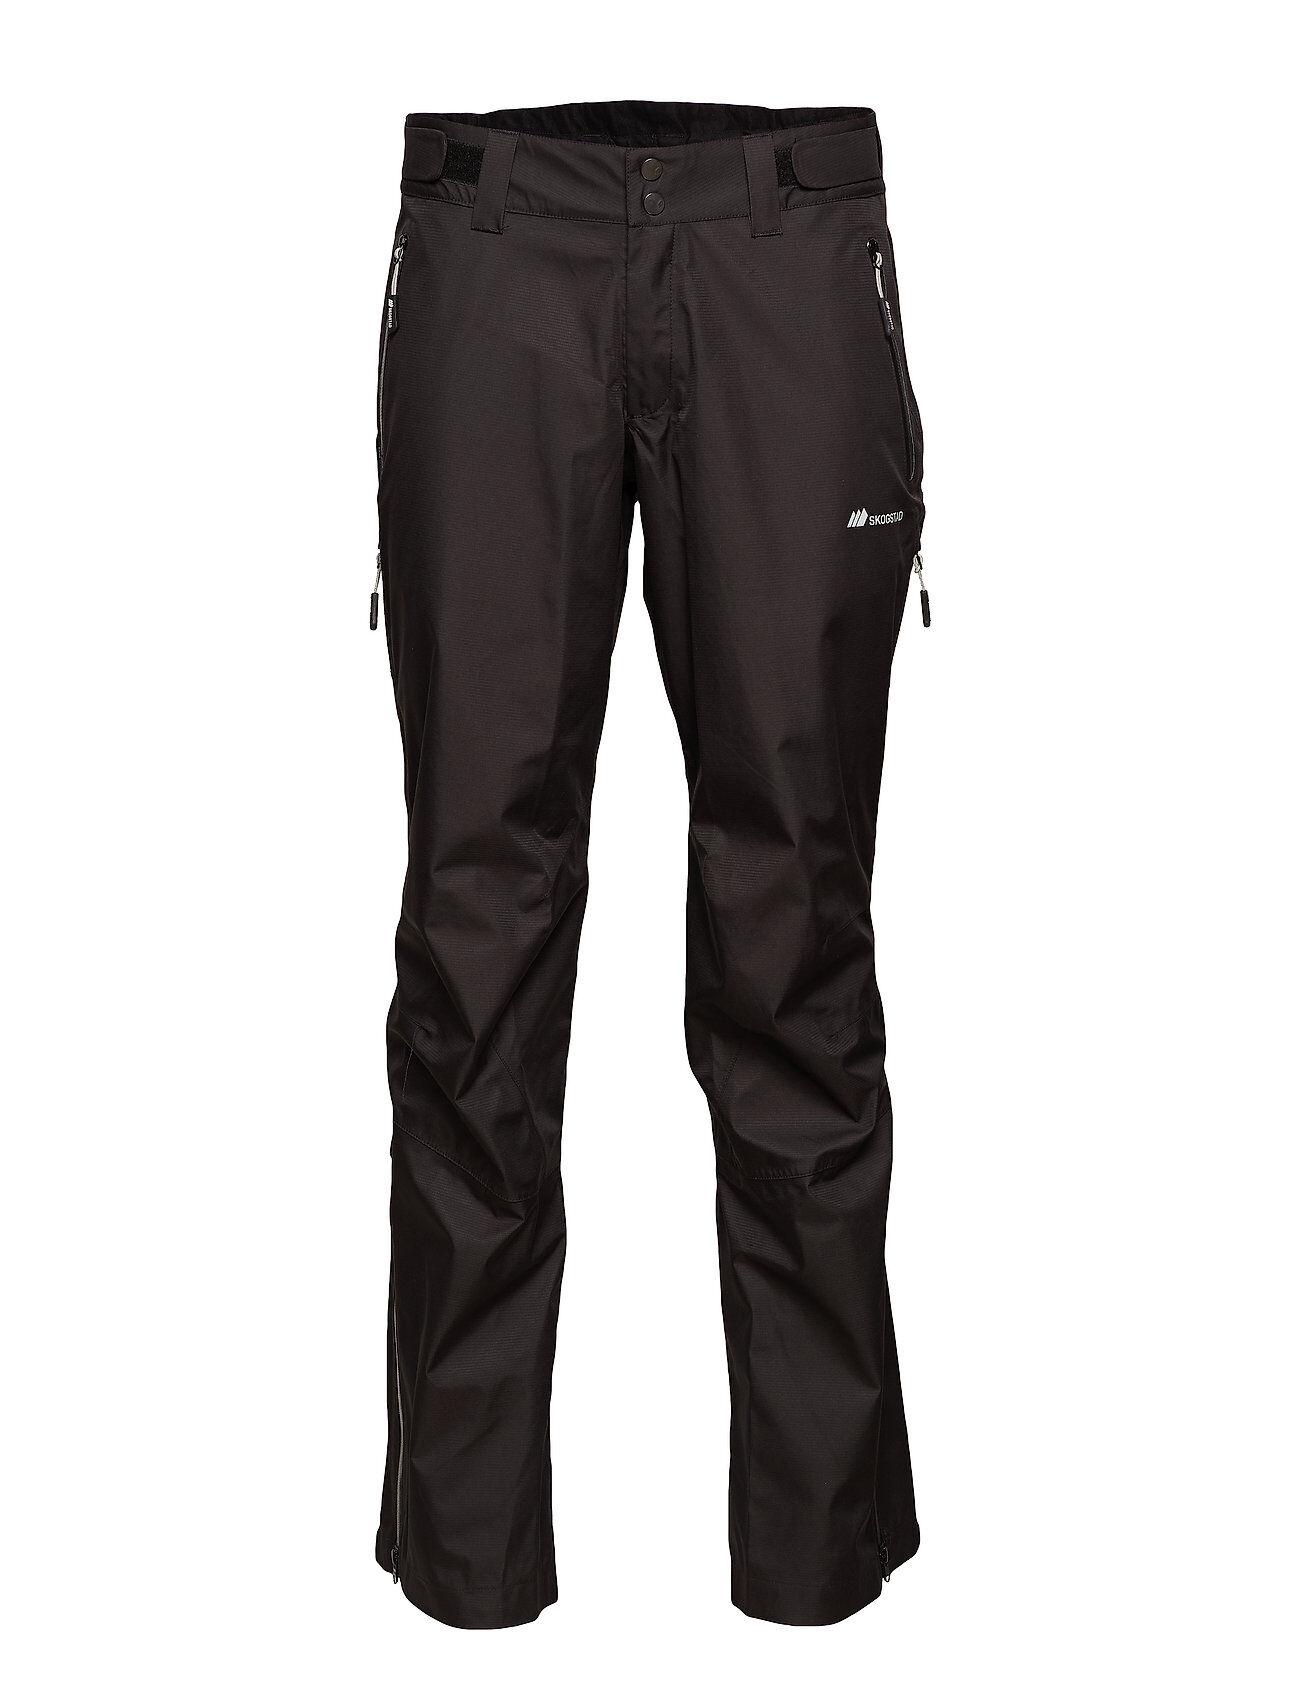 Skogstad Horgi 3-Layer Technical Shell Trouser Sport Pants Musta